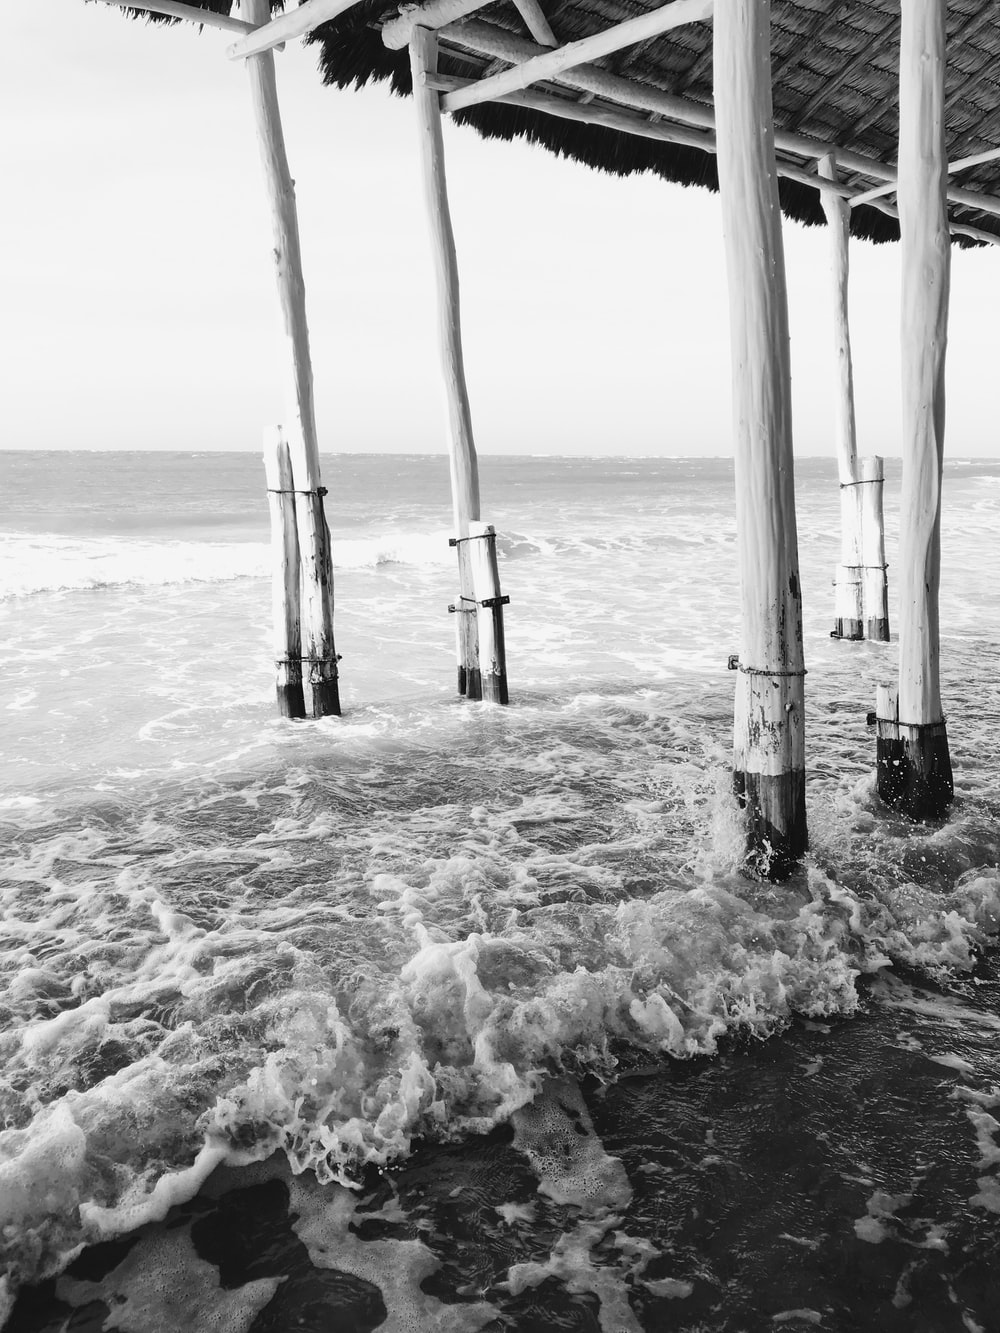 grayscale photo of sea waves crashing on shore